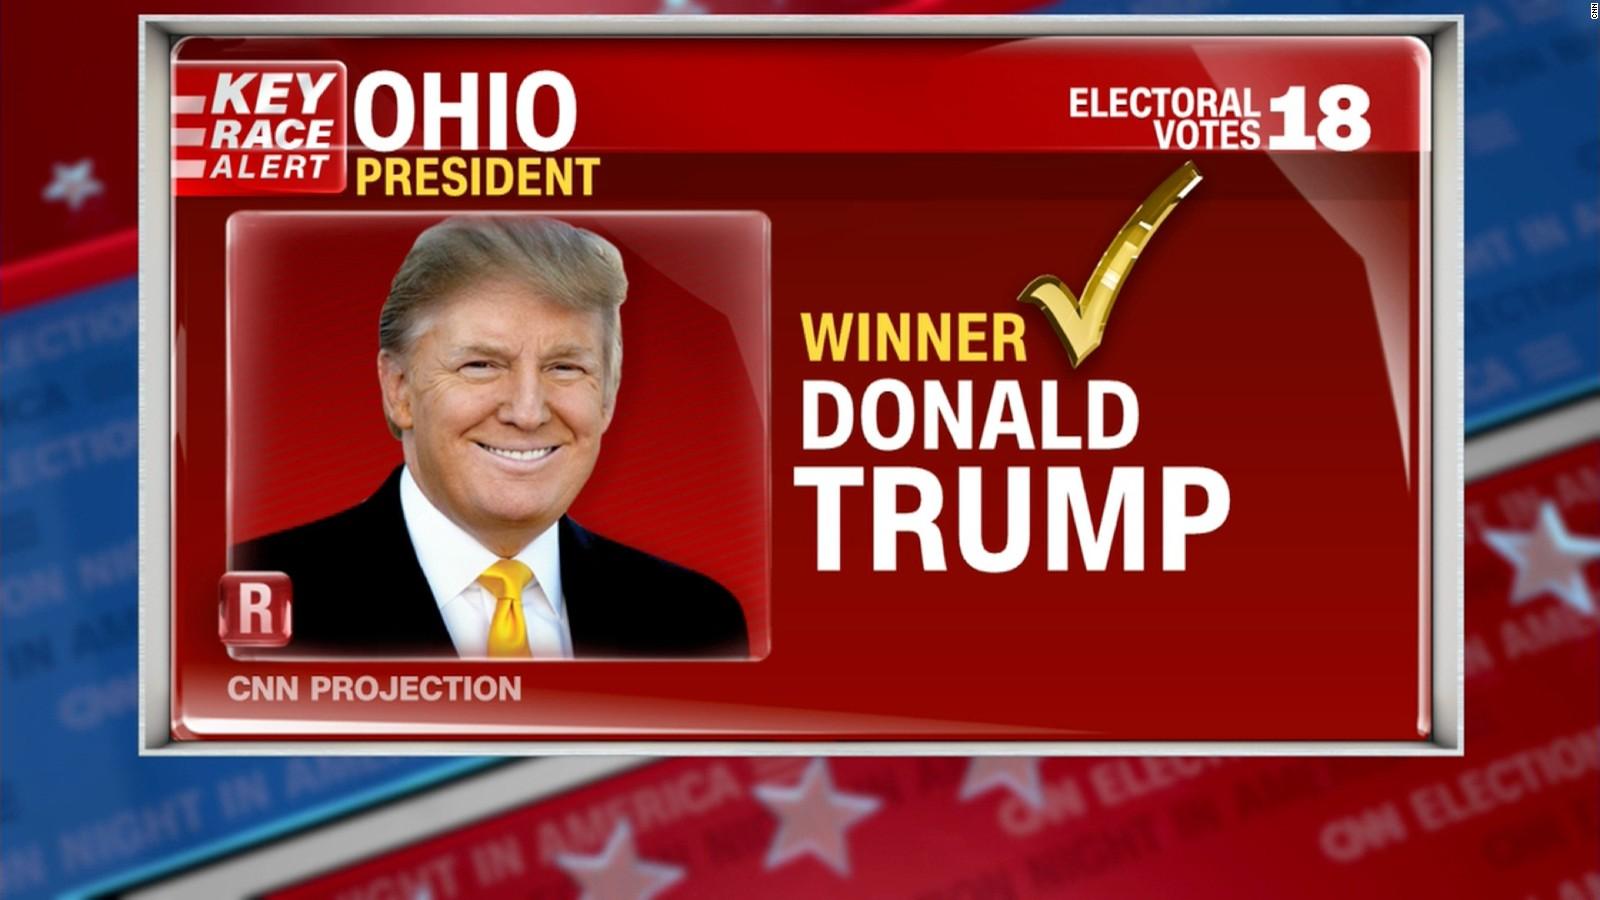 161108223616-trump-wins-ohio-full-169.jp